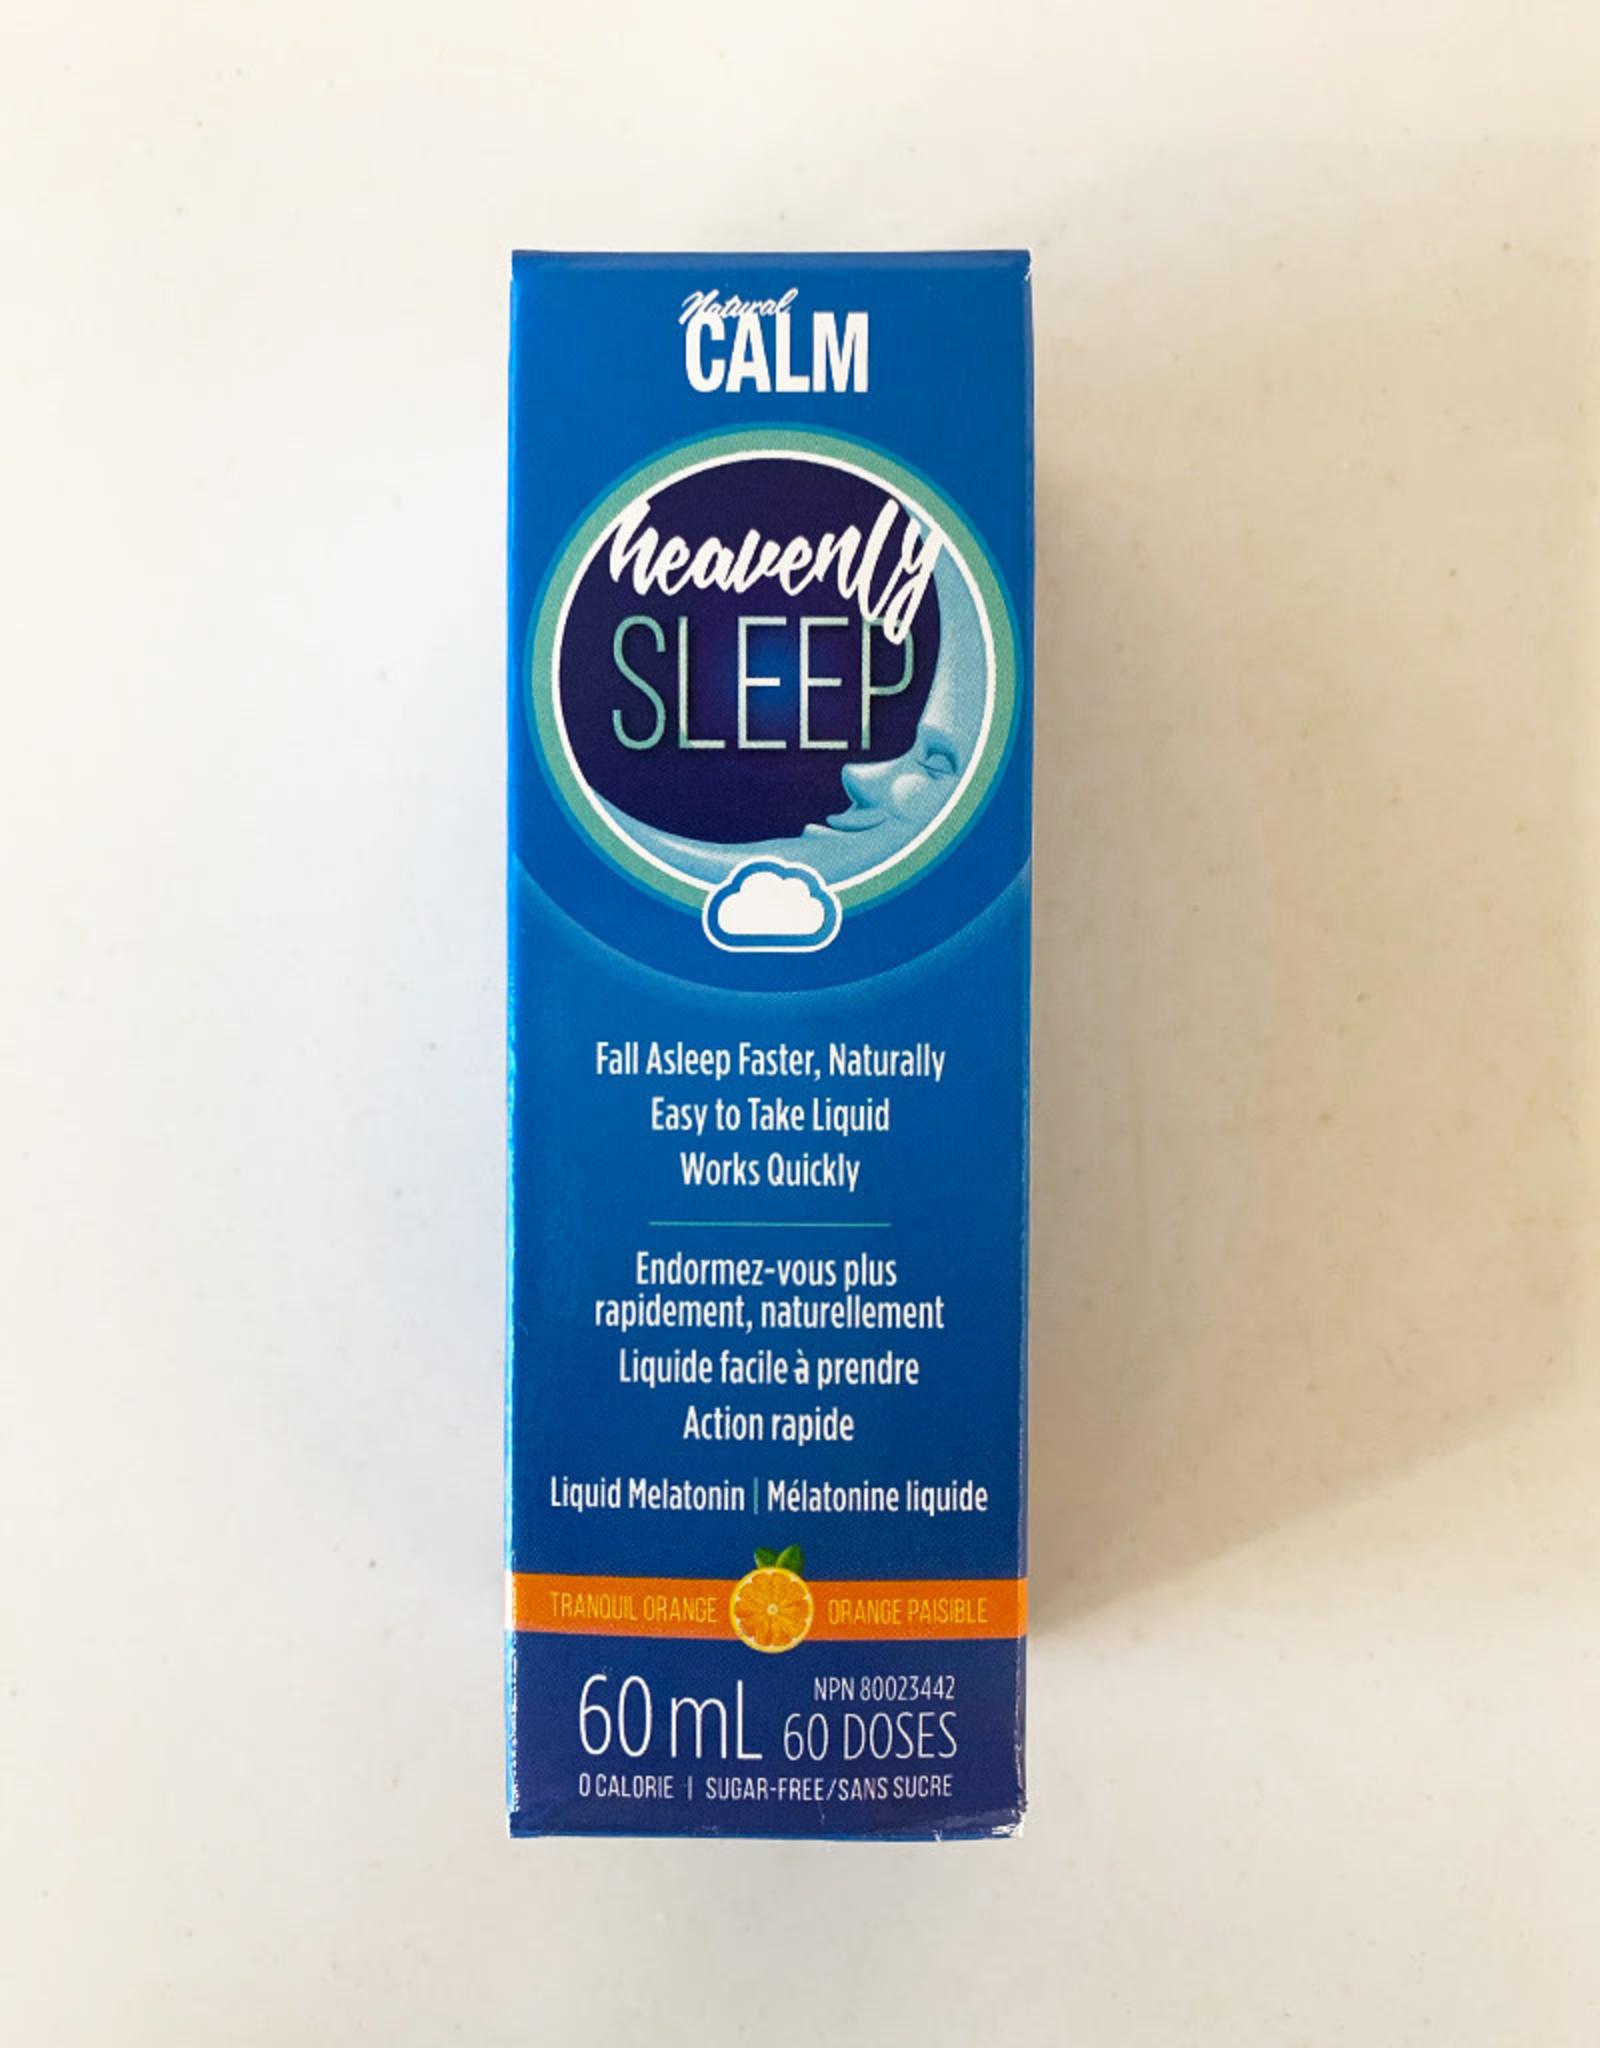 Naturally Calm Natural Calm - Heavenly Sleep Liquid Melatonin (60ml)